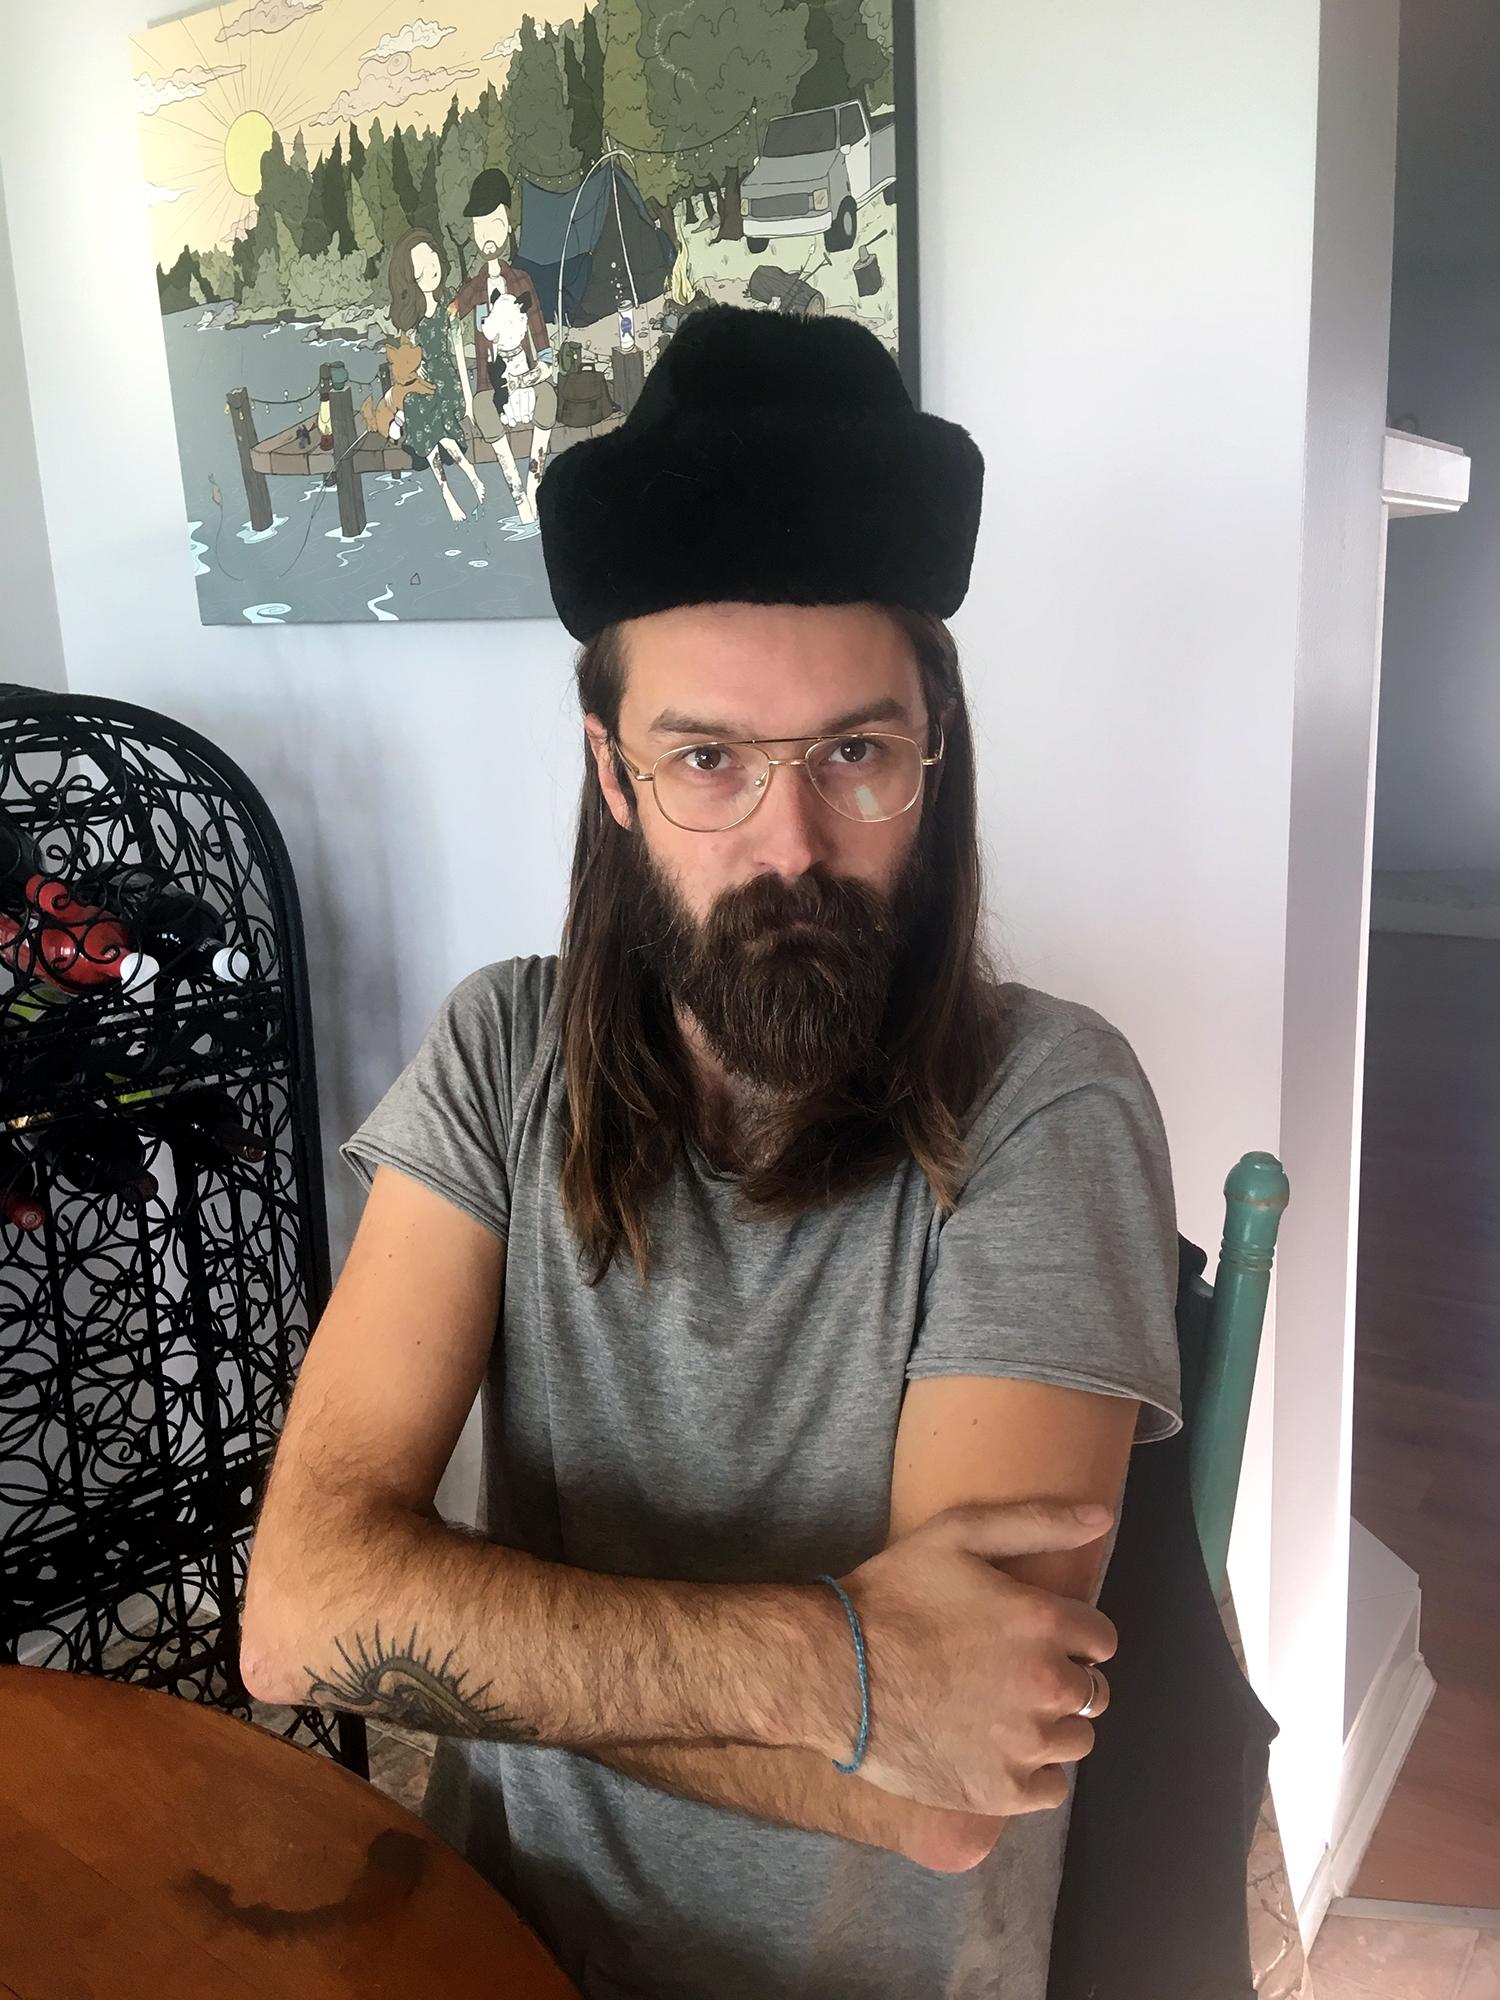 Generic Van Life - Banff Canmore Justin Russian Hat